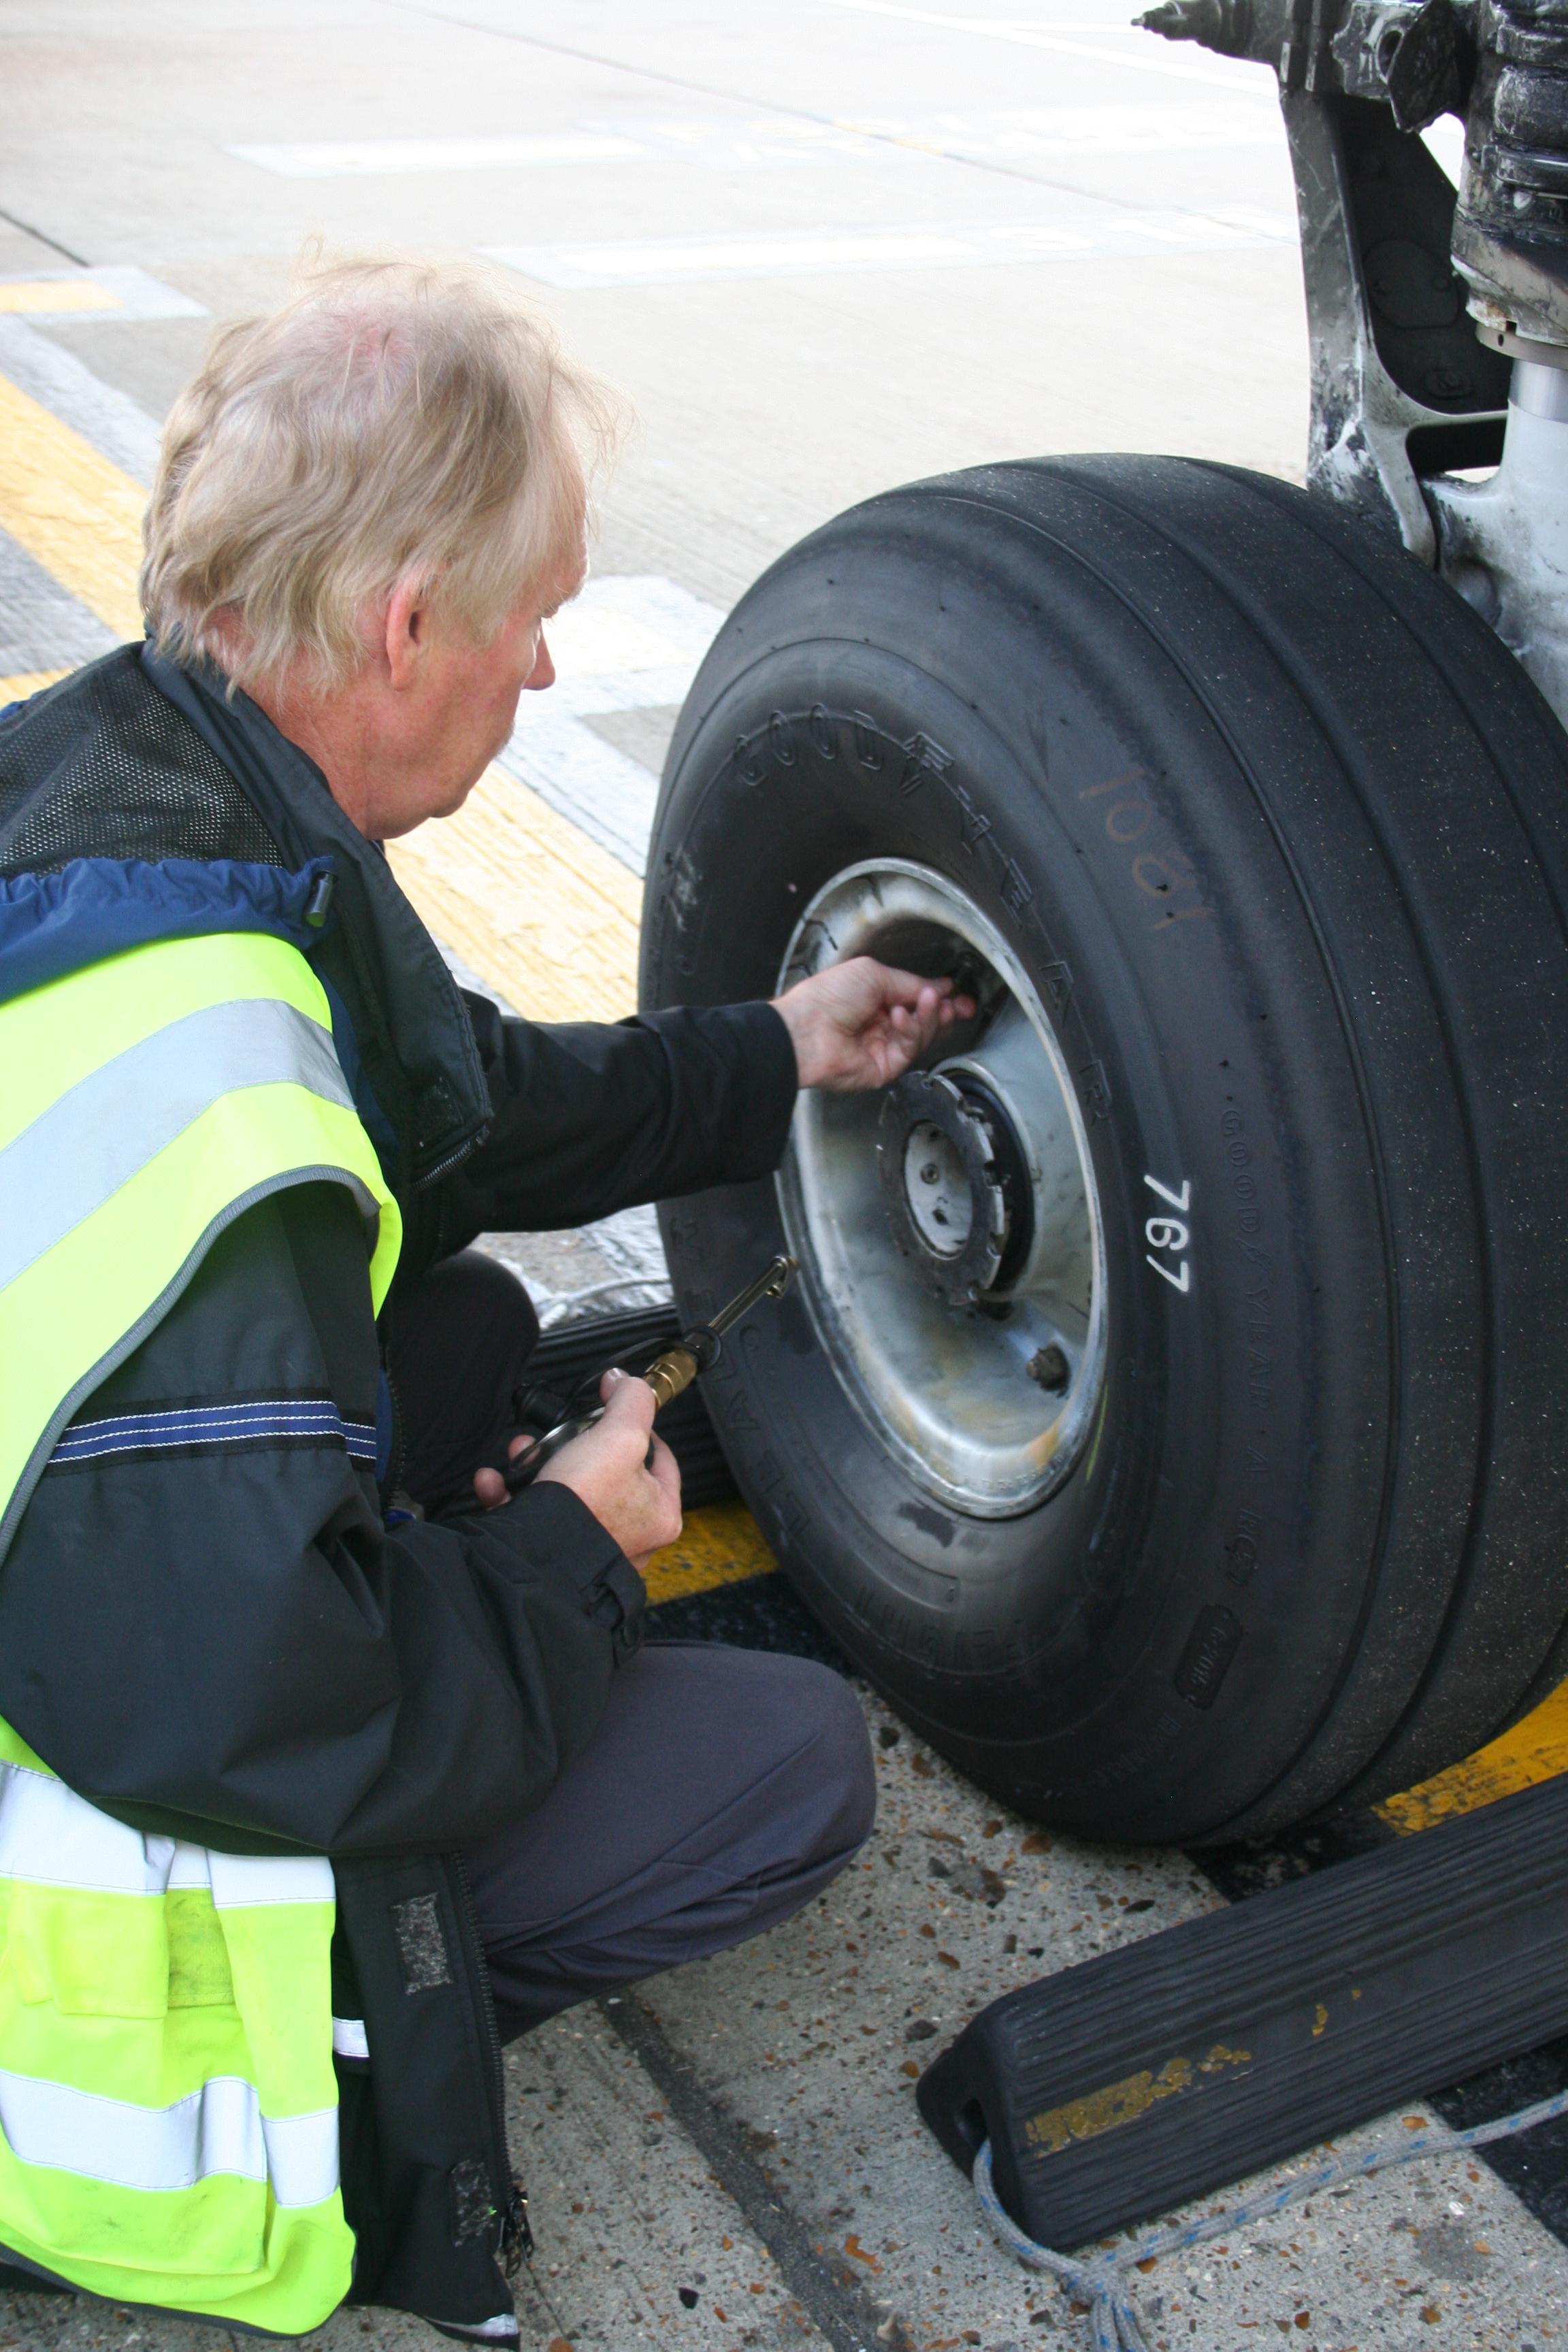 Man fixing a tire